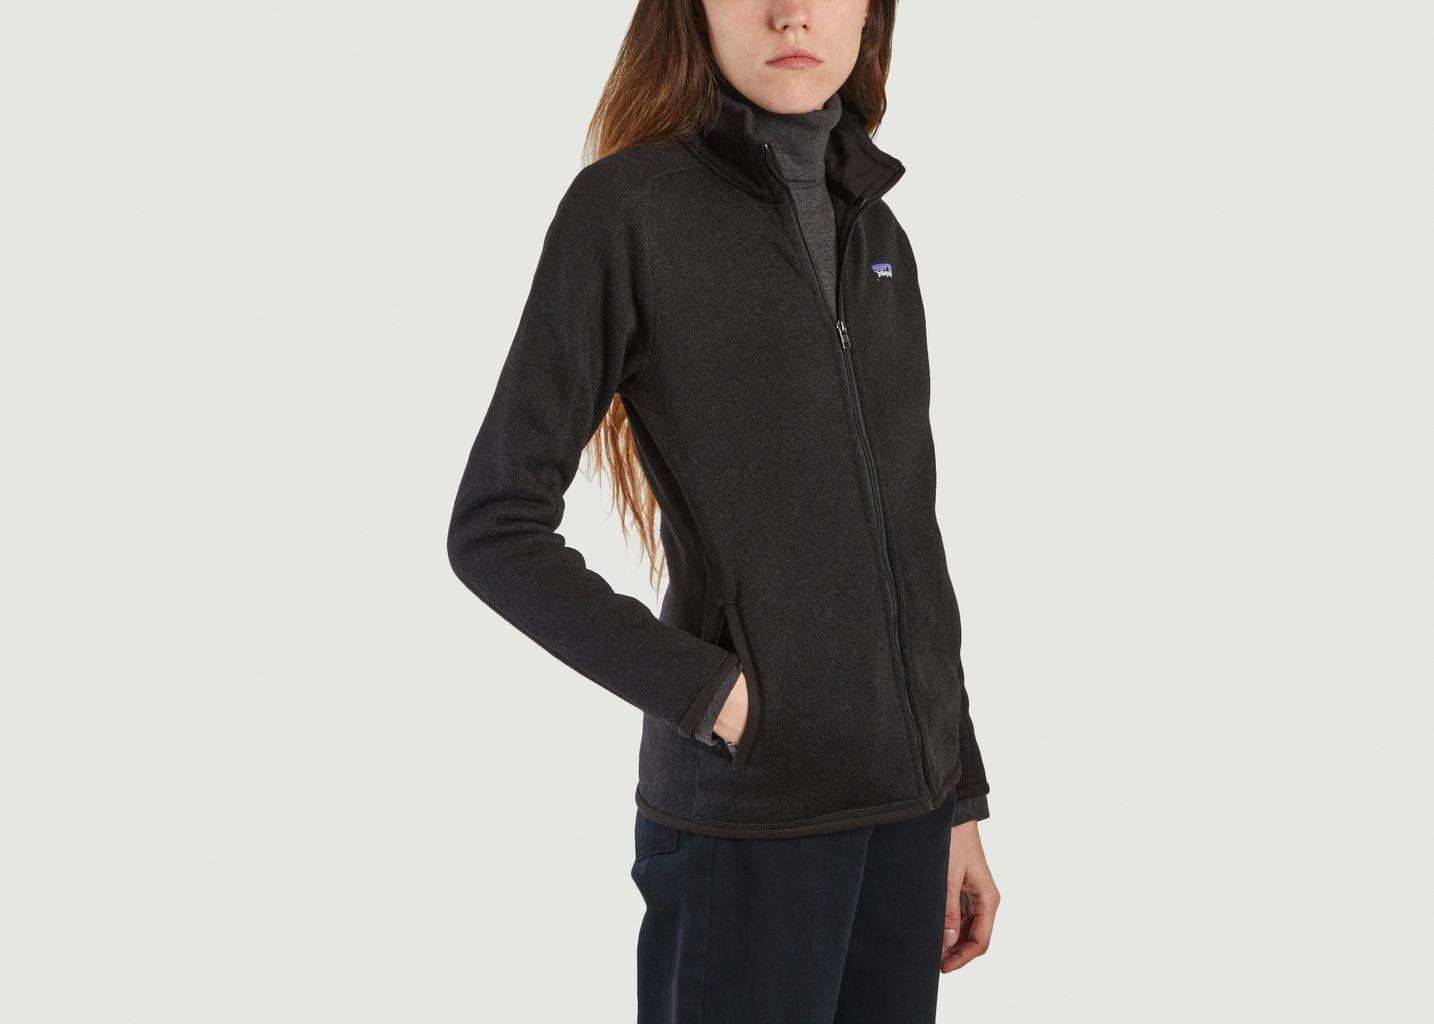 Veste Better Sweater  - Patagonia